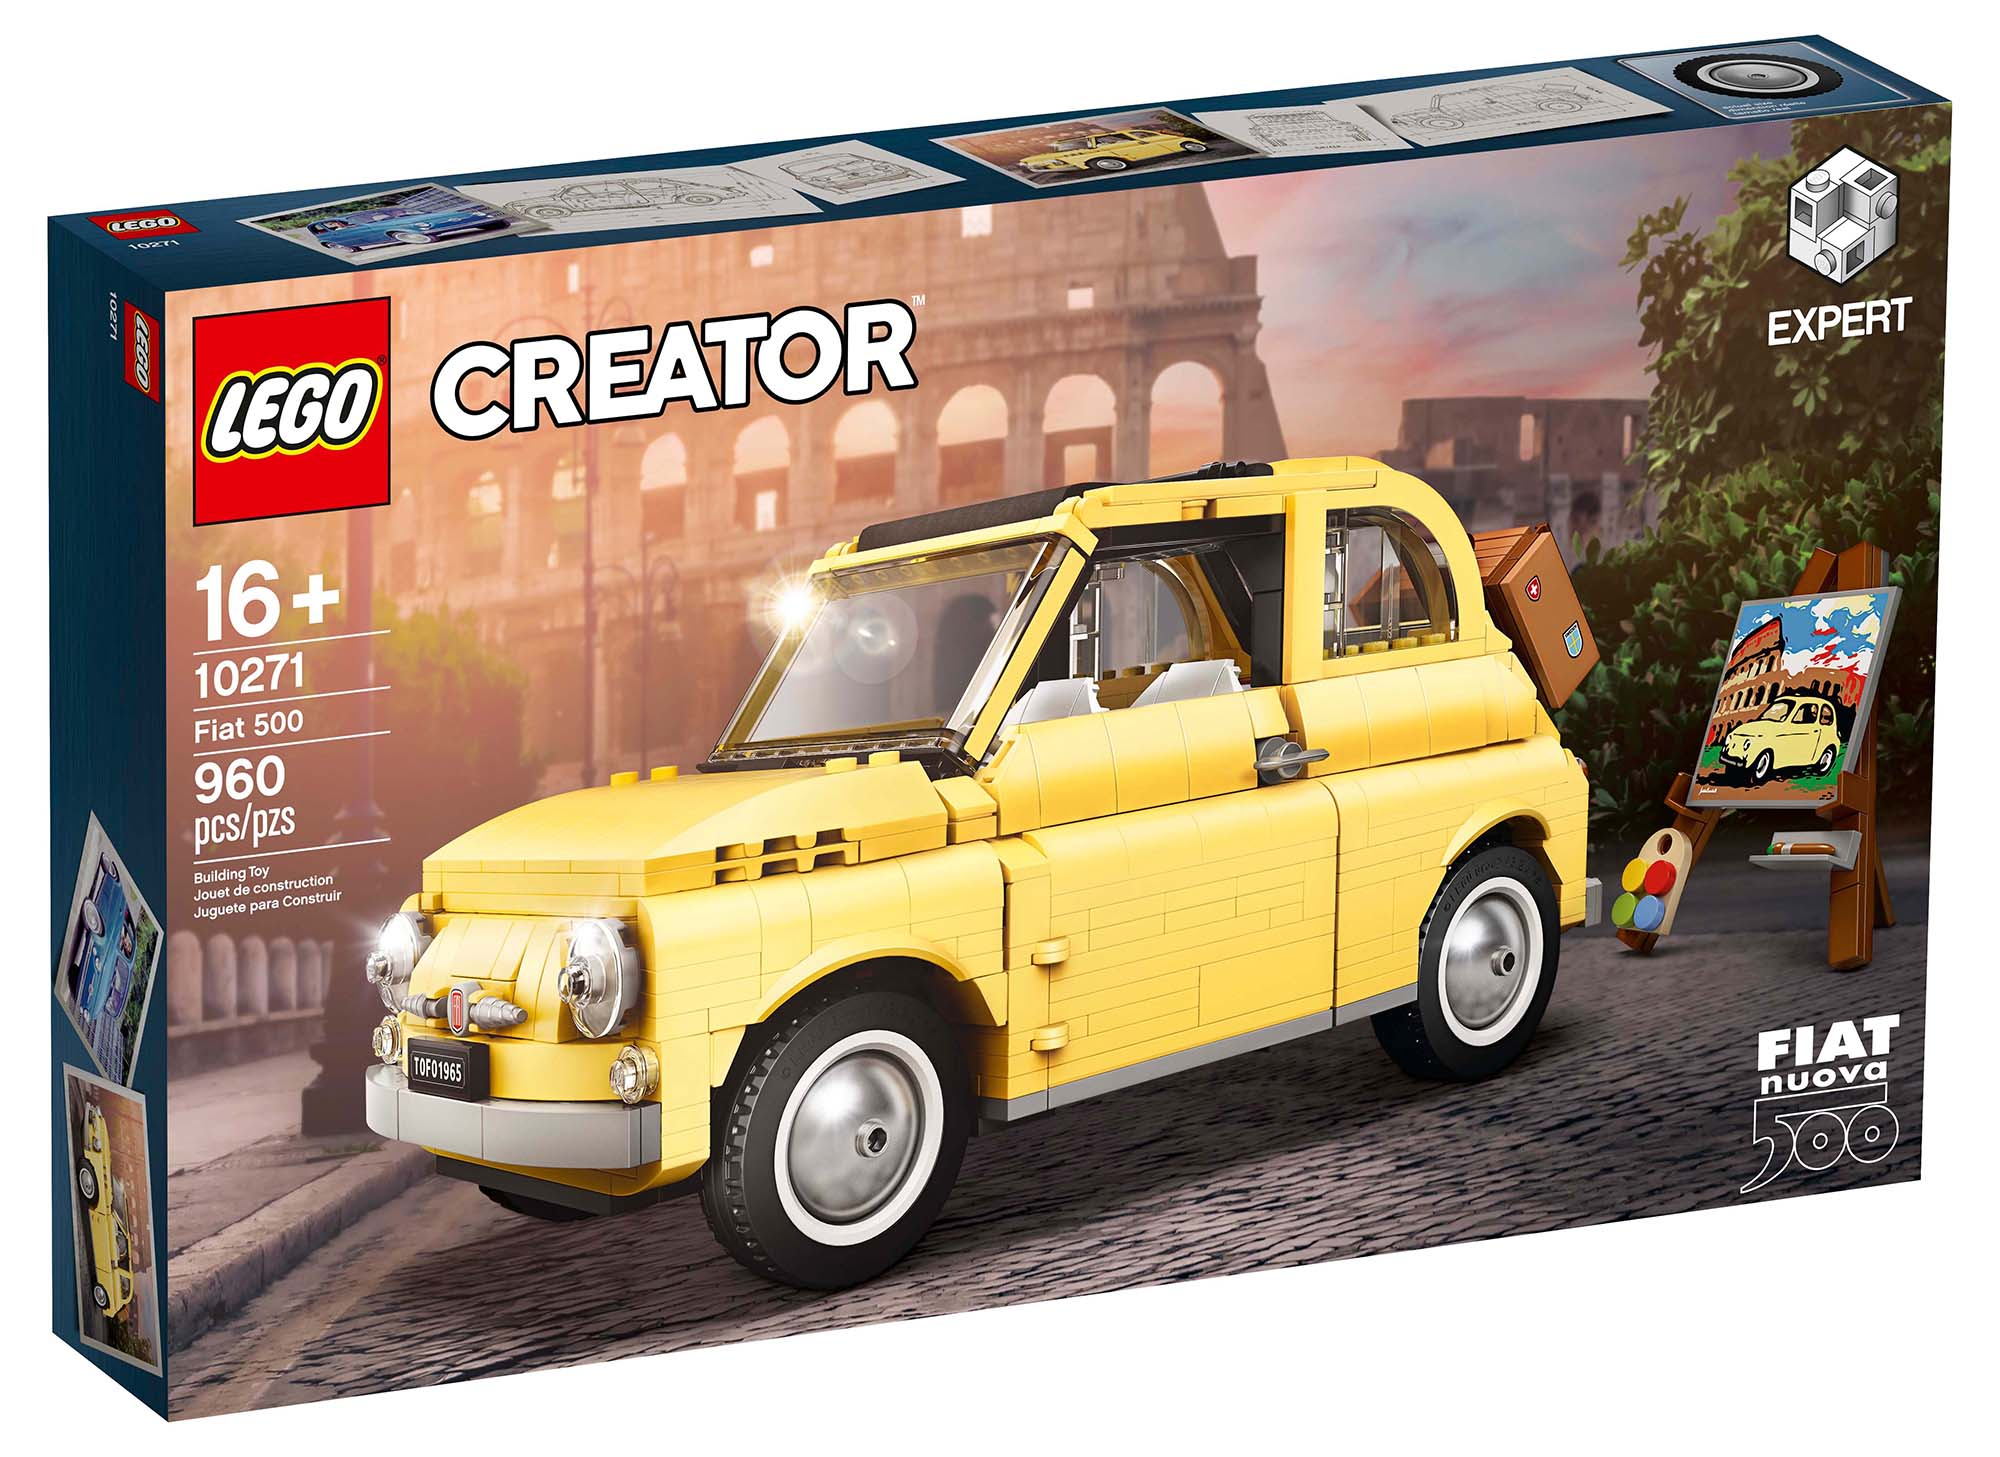 LEGO Creator Expert 10271 Fiat 500 Box